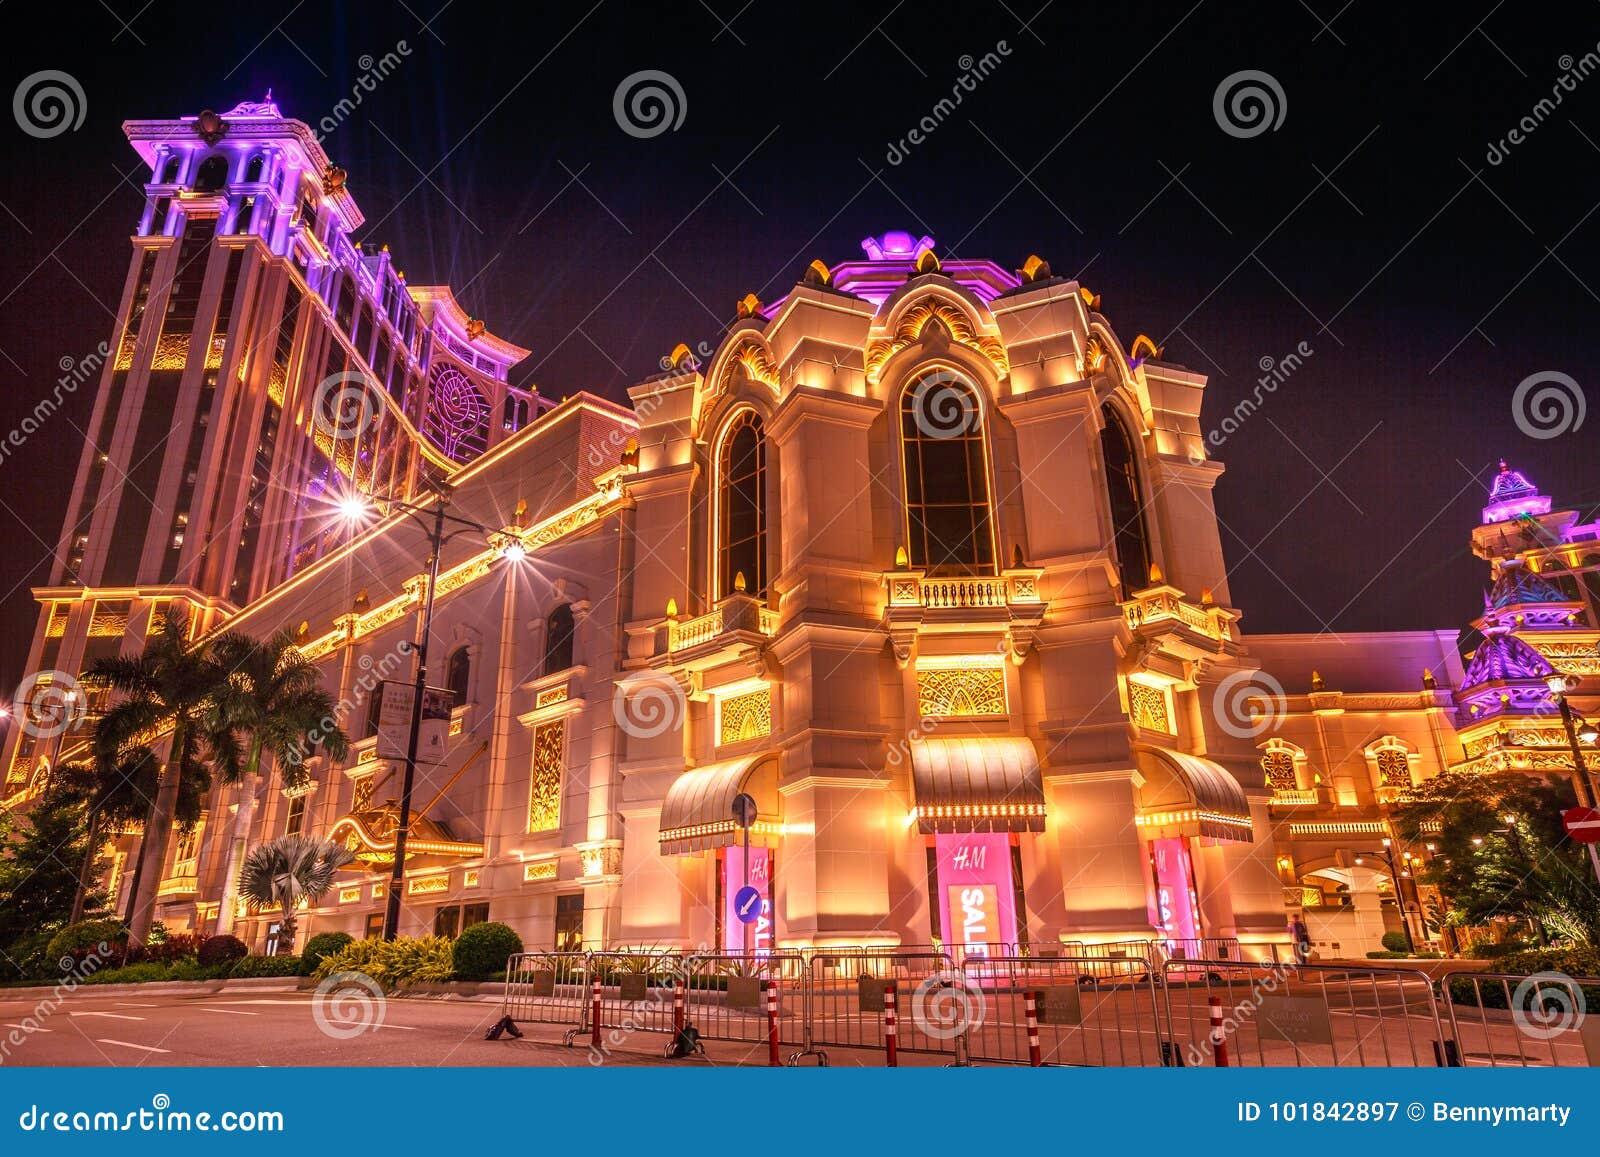 Jupiter Casino Show